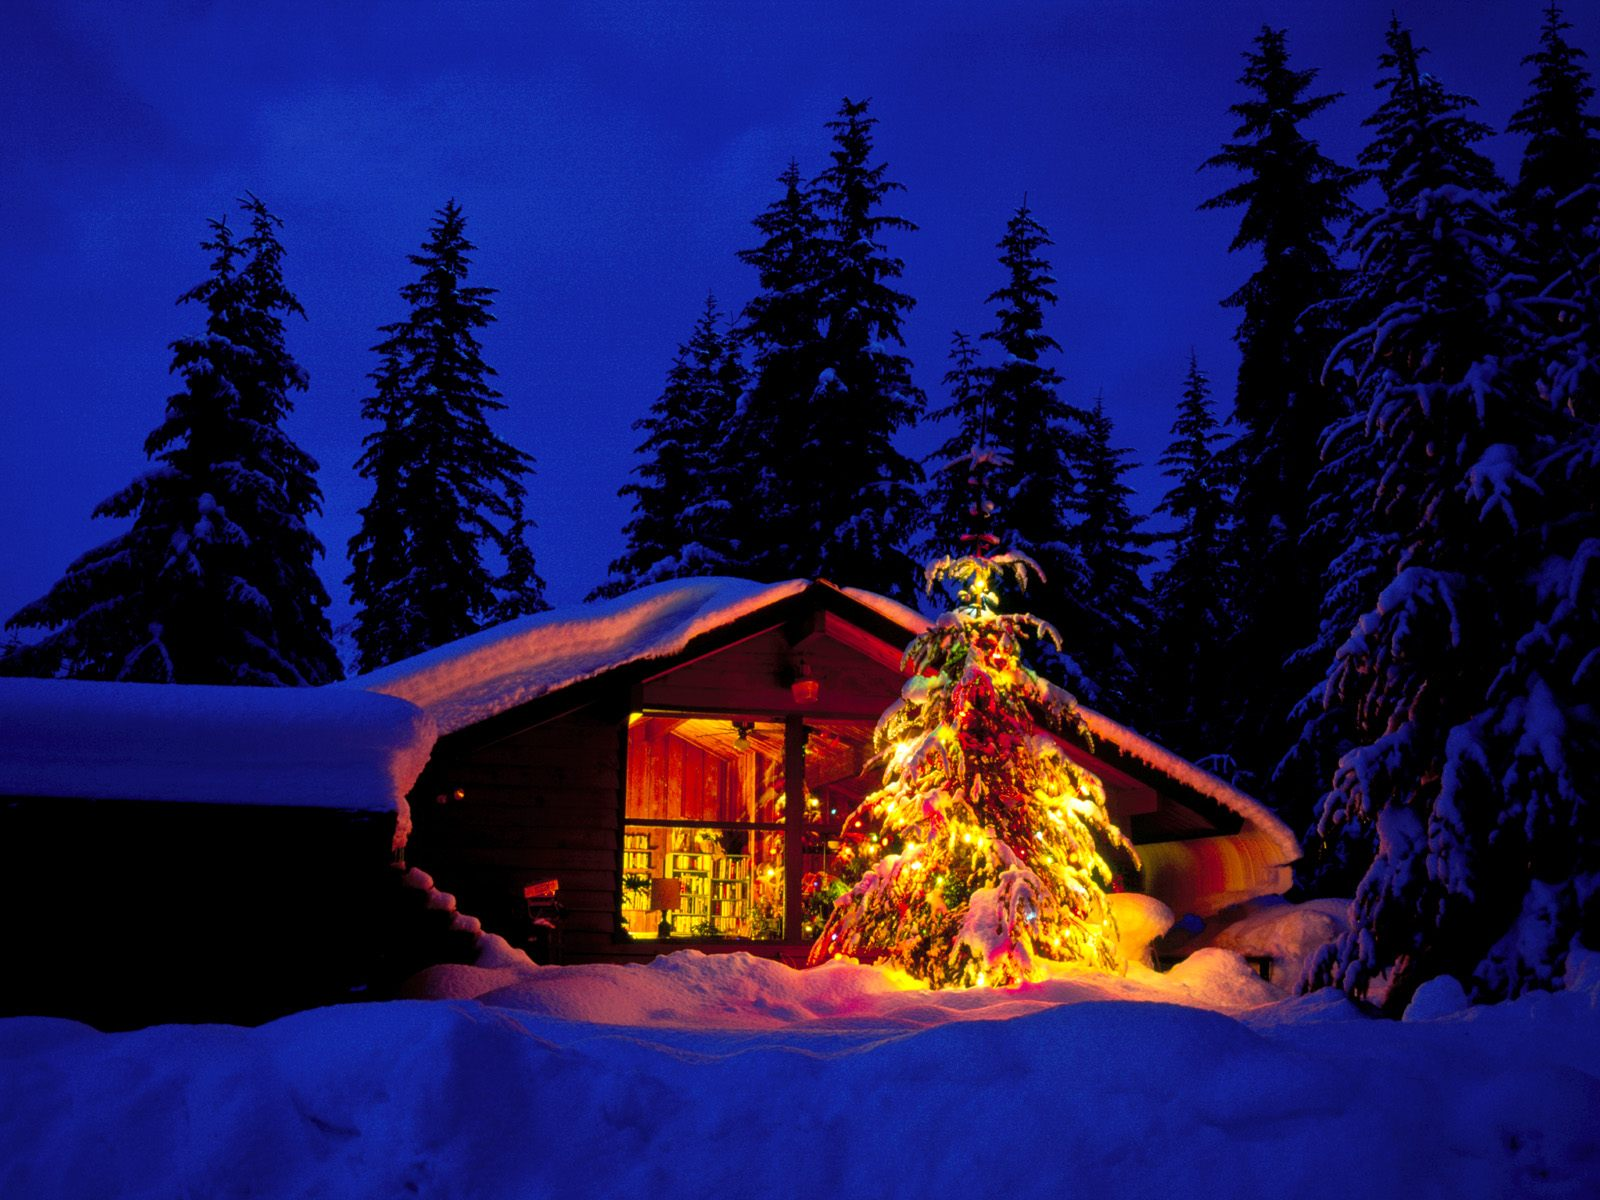 Christmas Wallpaper | 3D Wallpaper | Nature Wallpaper | Free Download Wallpaper